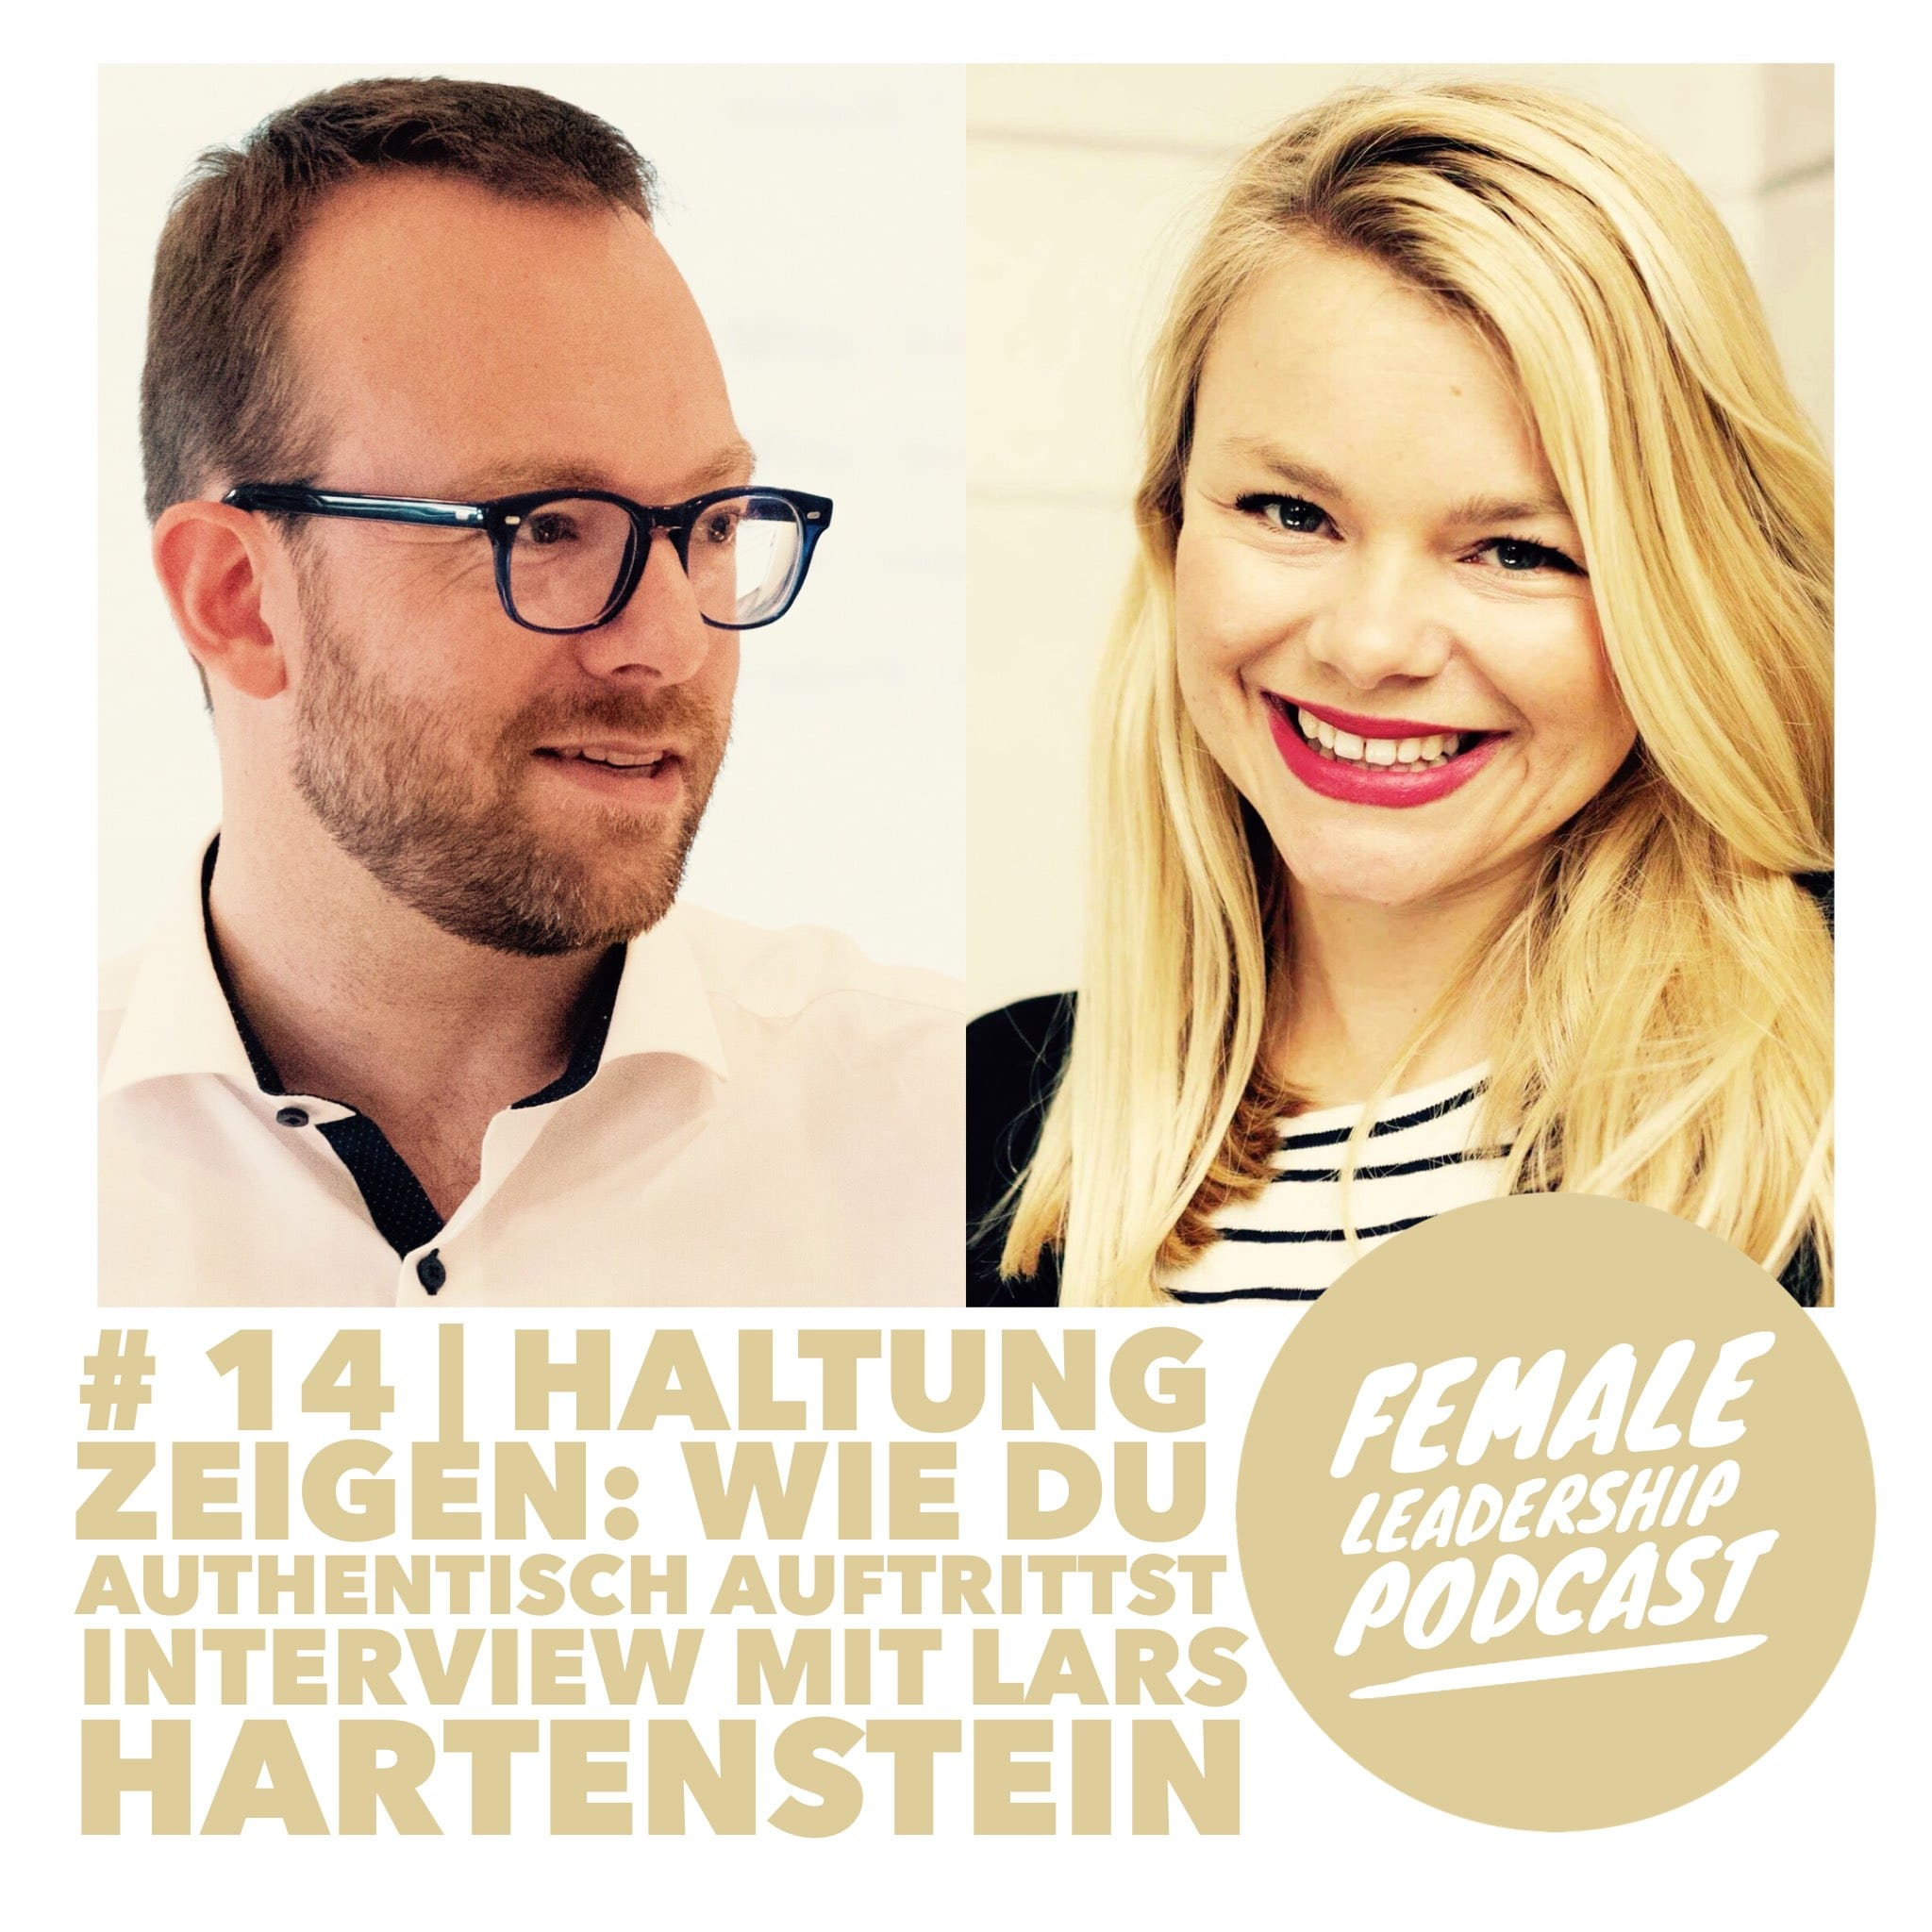 Lars-Hartenstein